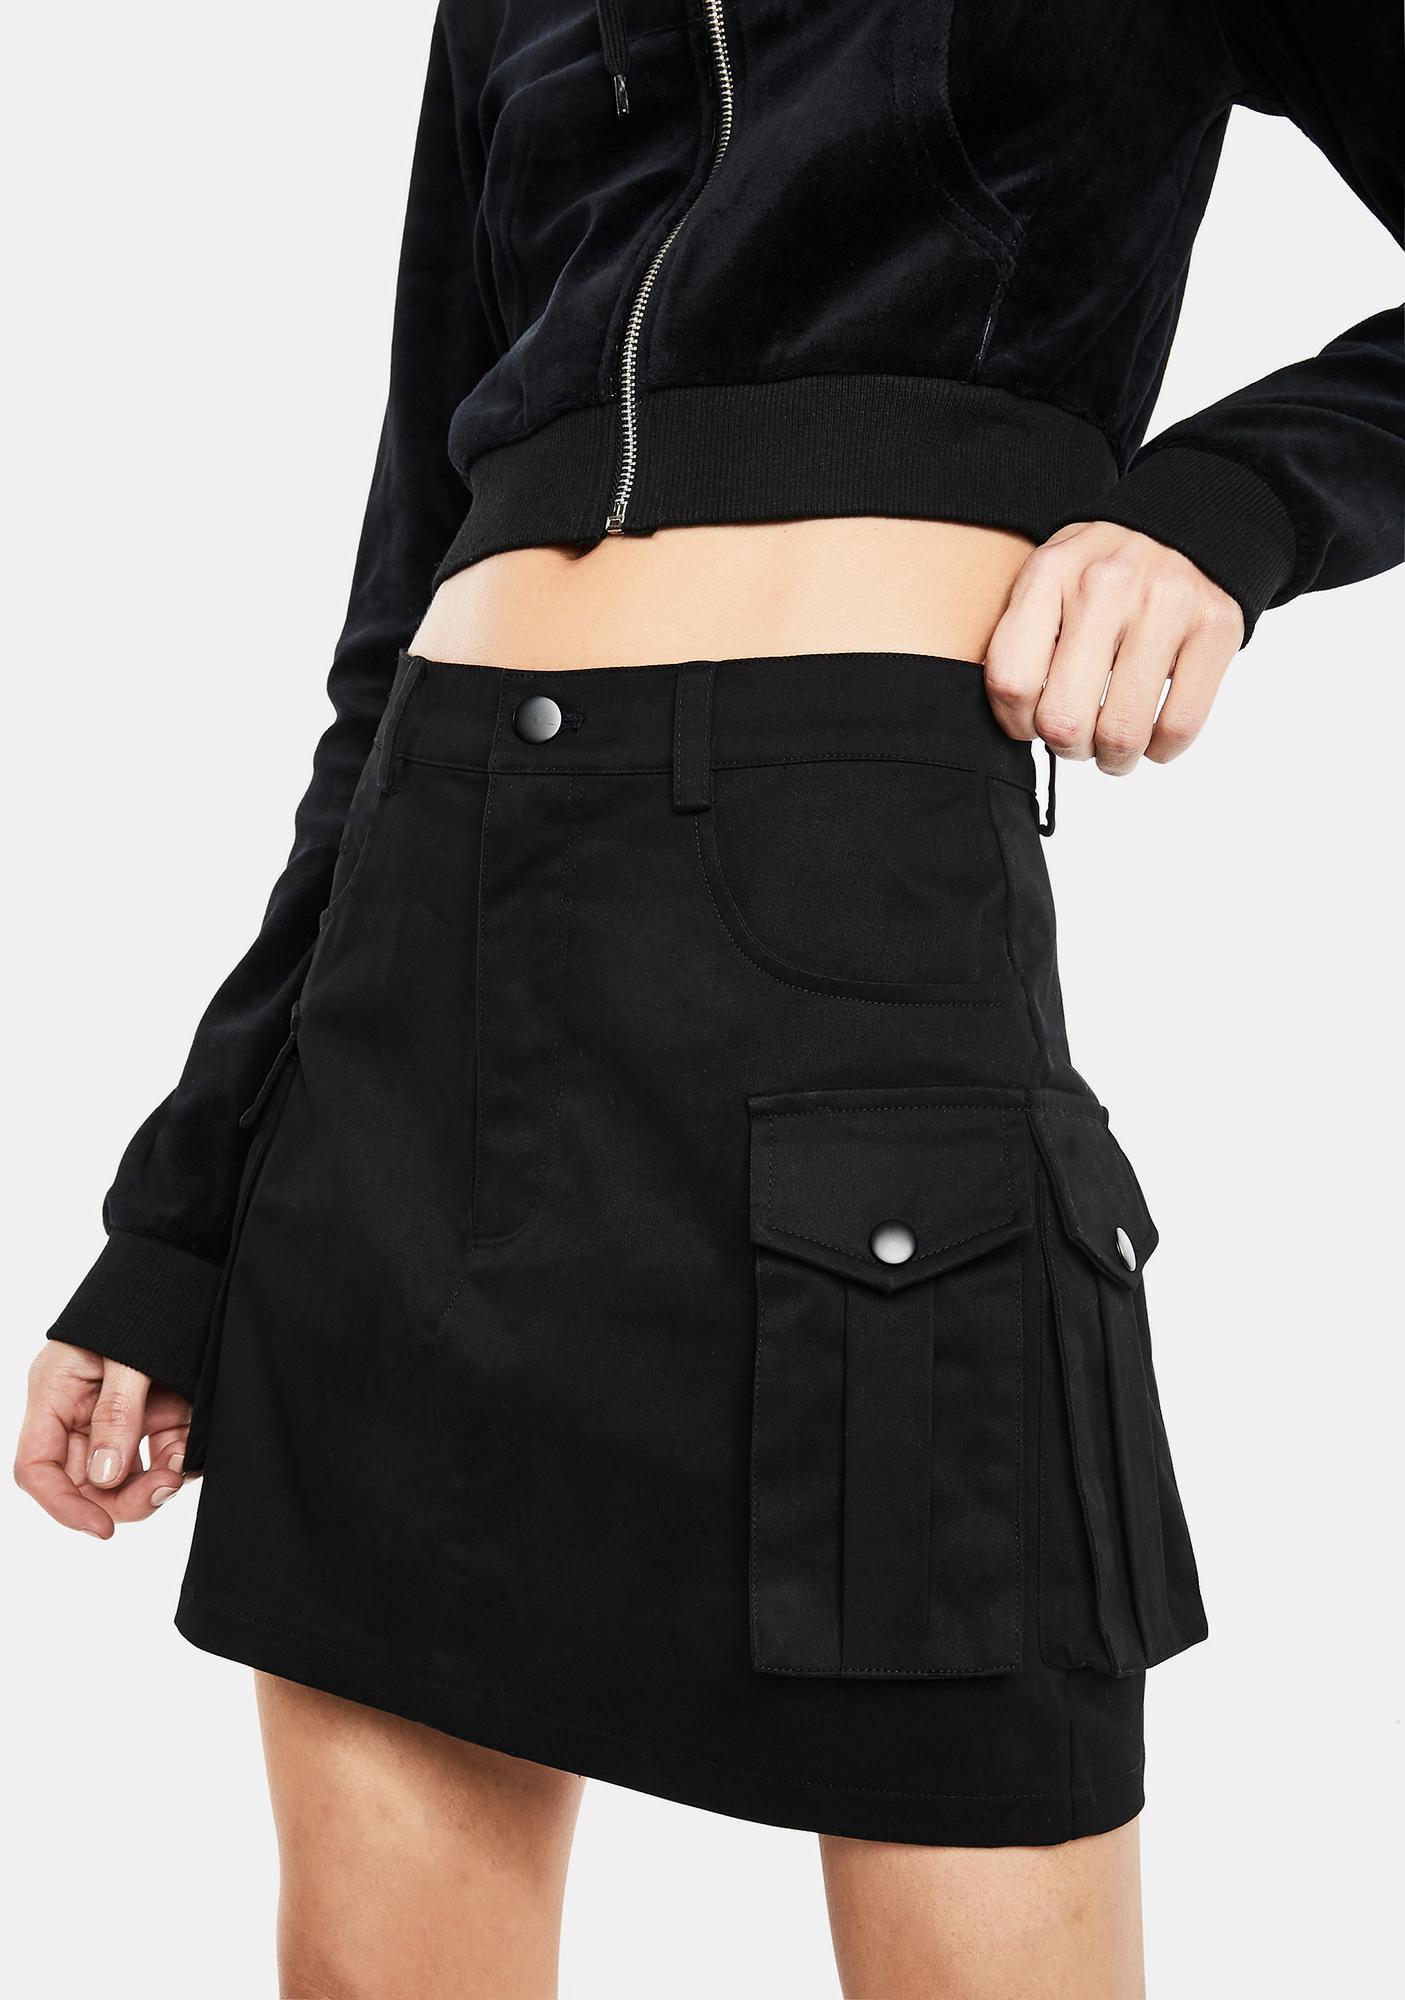 Club Exx Set For Action Cargo Skirt